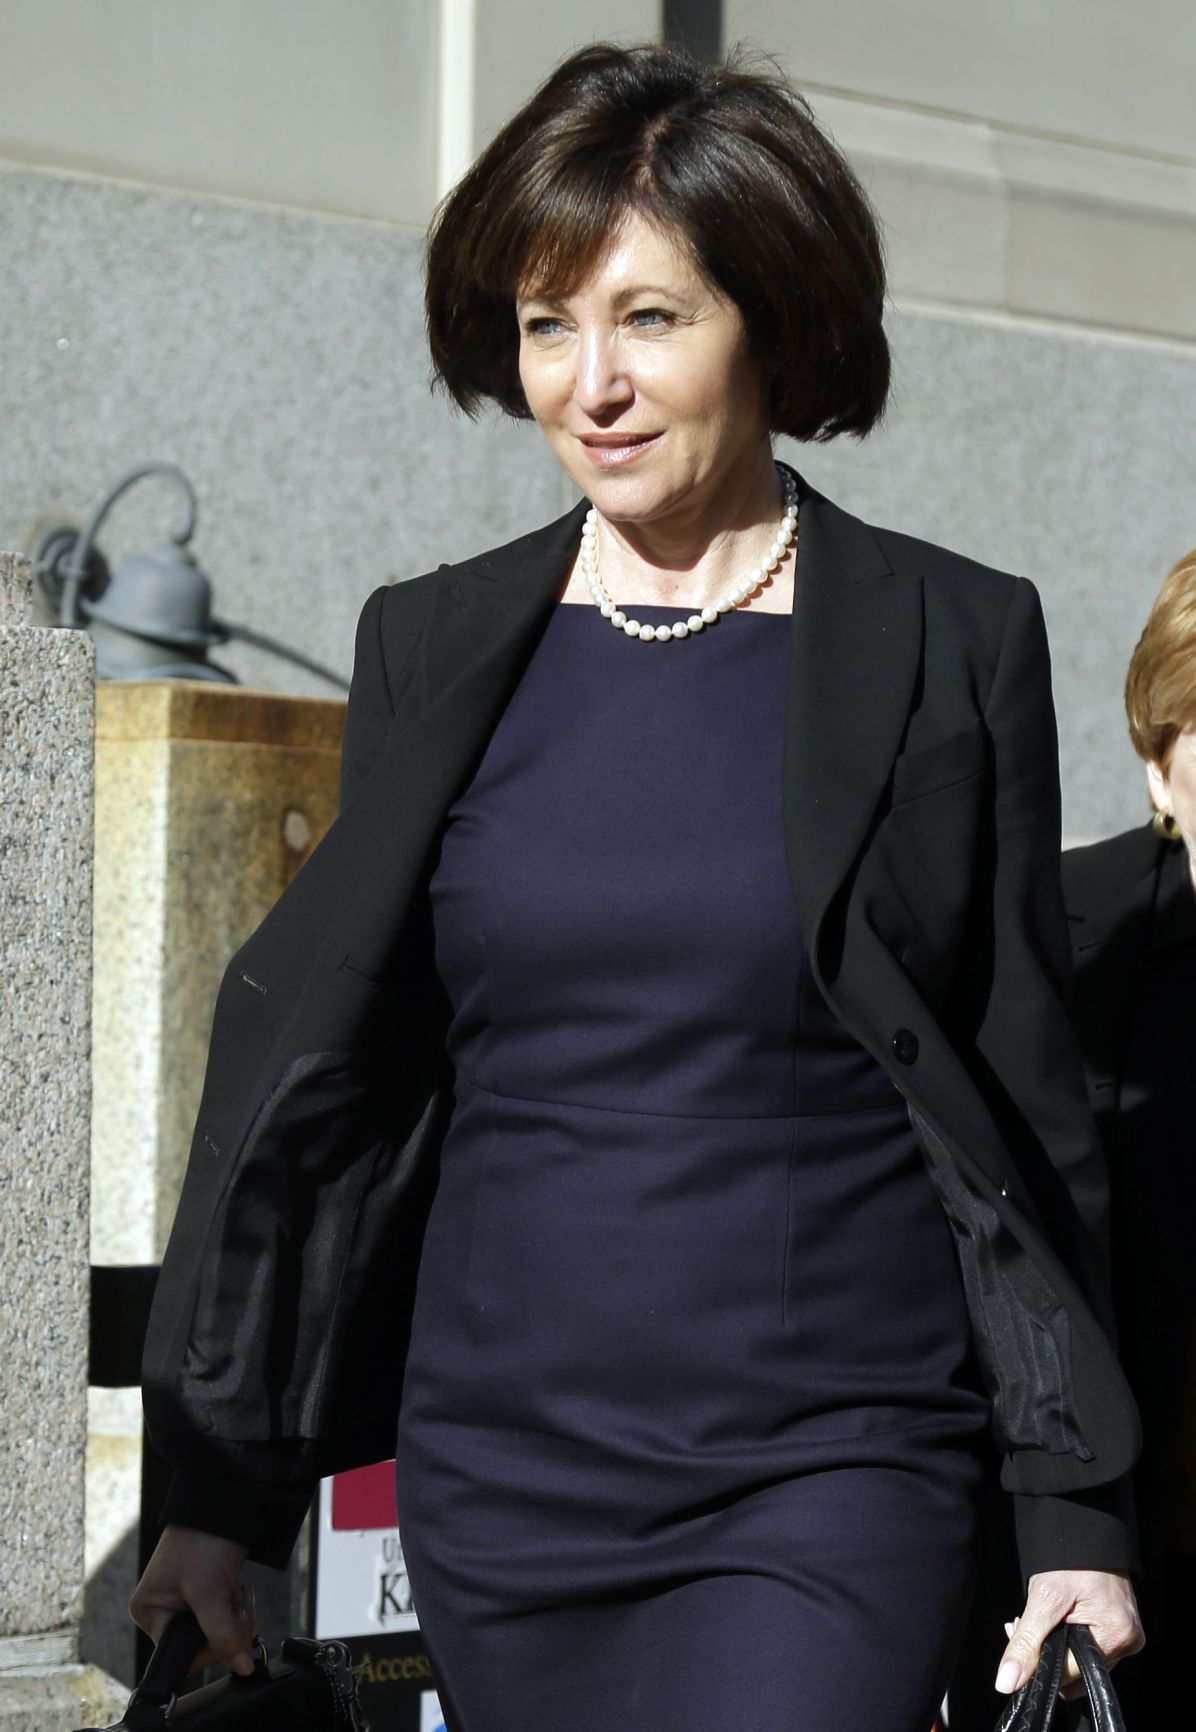 Anheuser-Busch discrimination suit in jury's hands